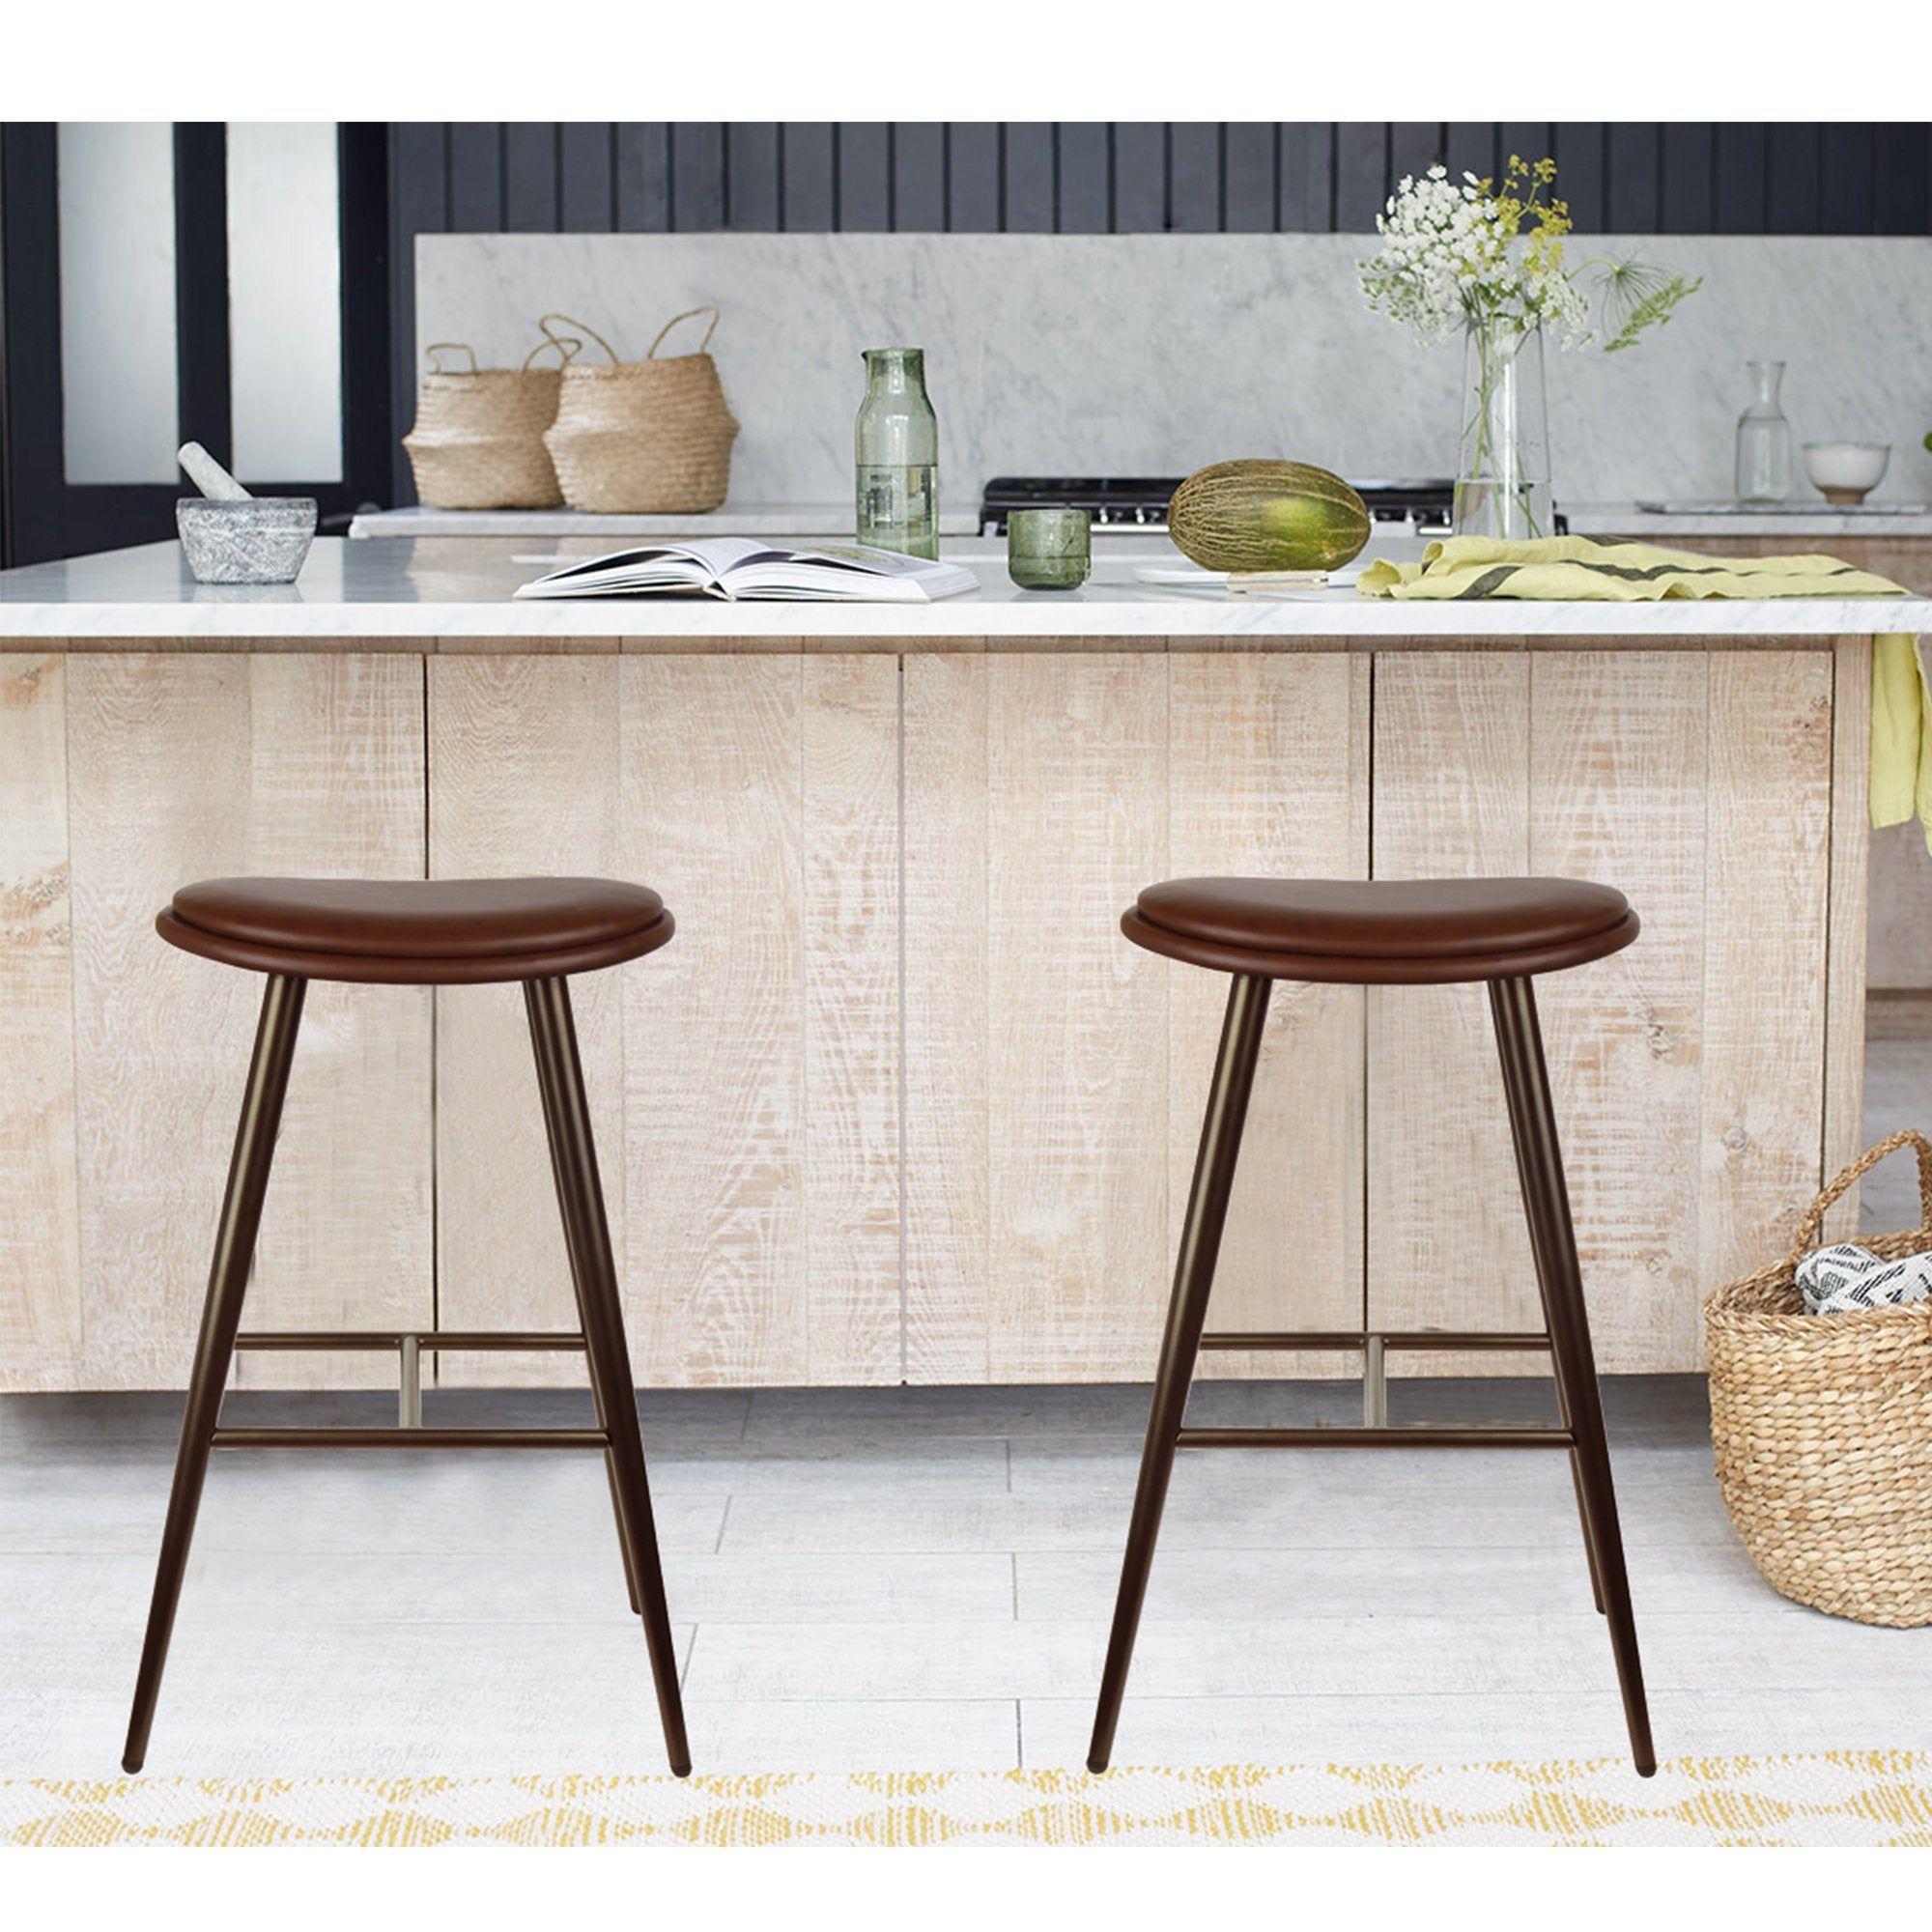 30 Saddle Seat Oval Metal Bar Stool With Vegan Leather Set Of 2 In 2020 Metal Bar Stools Bar Stools Antique Finish Furniture